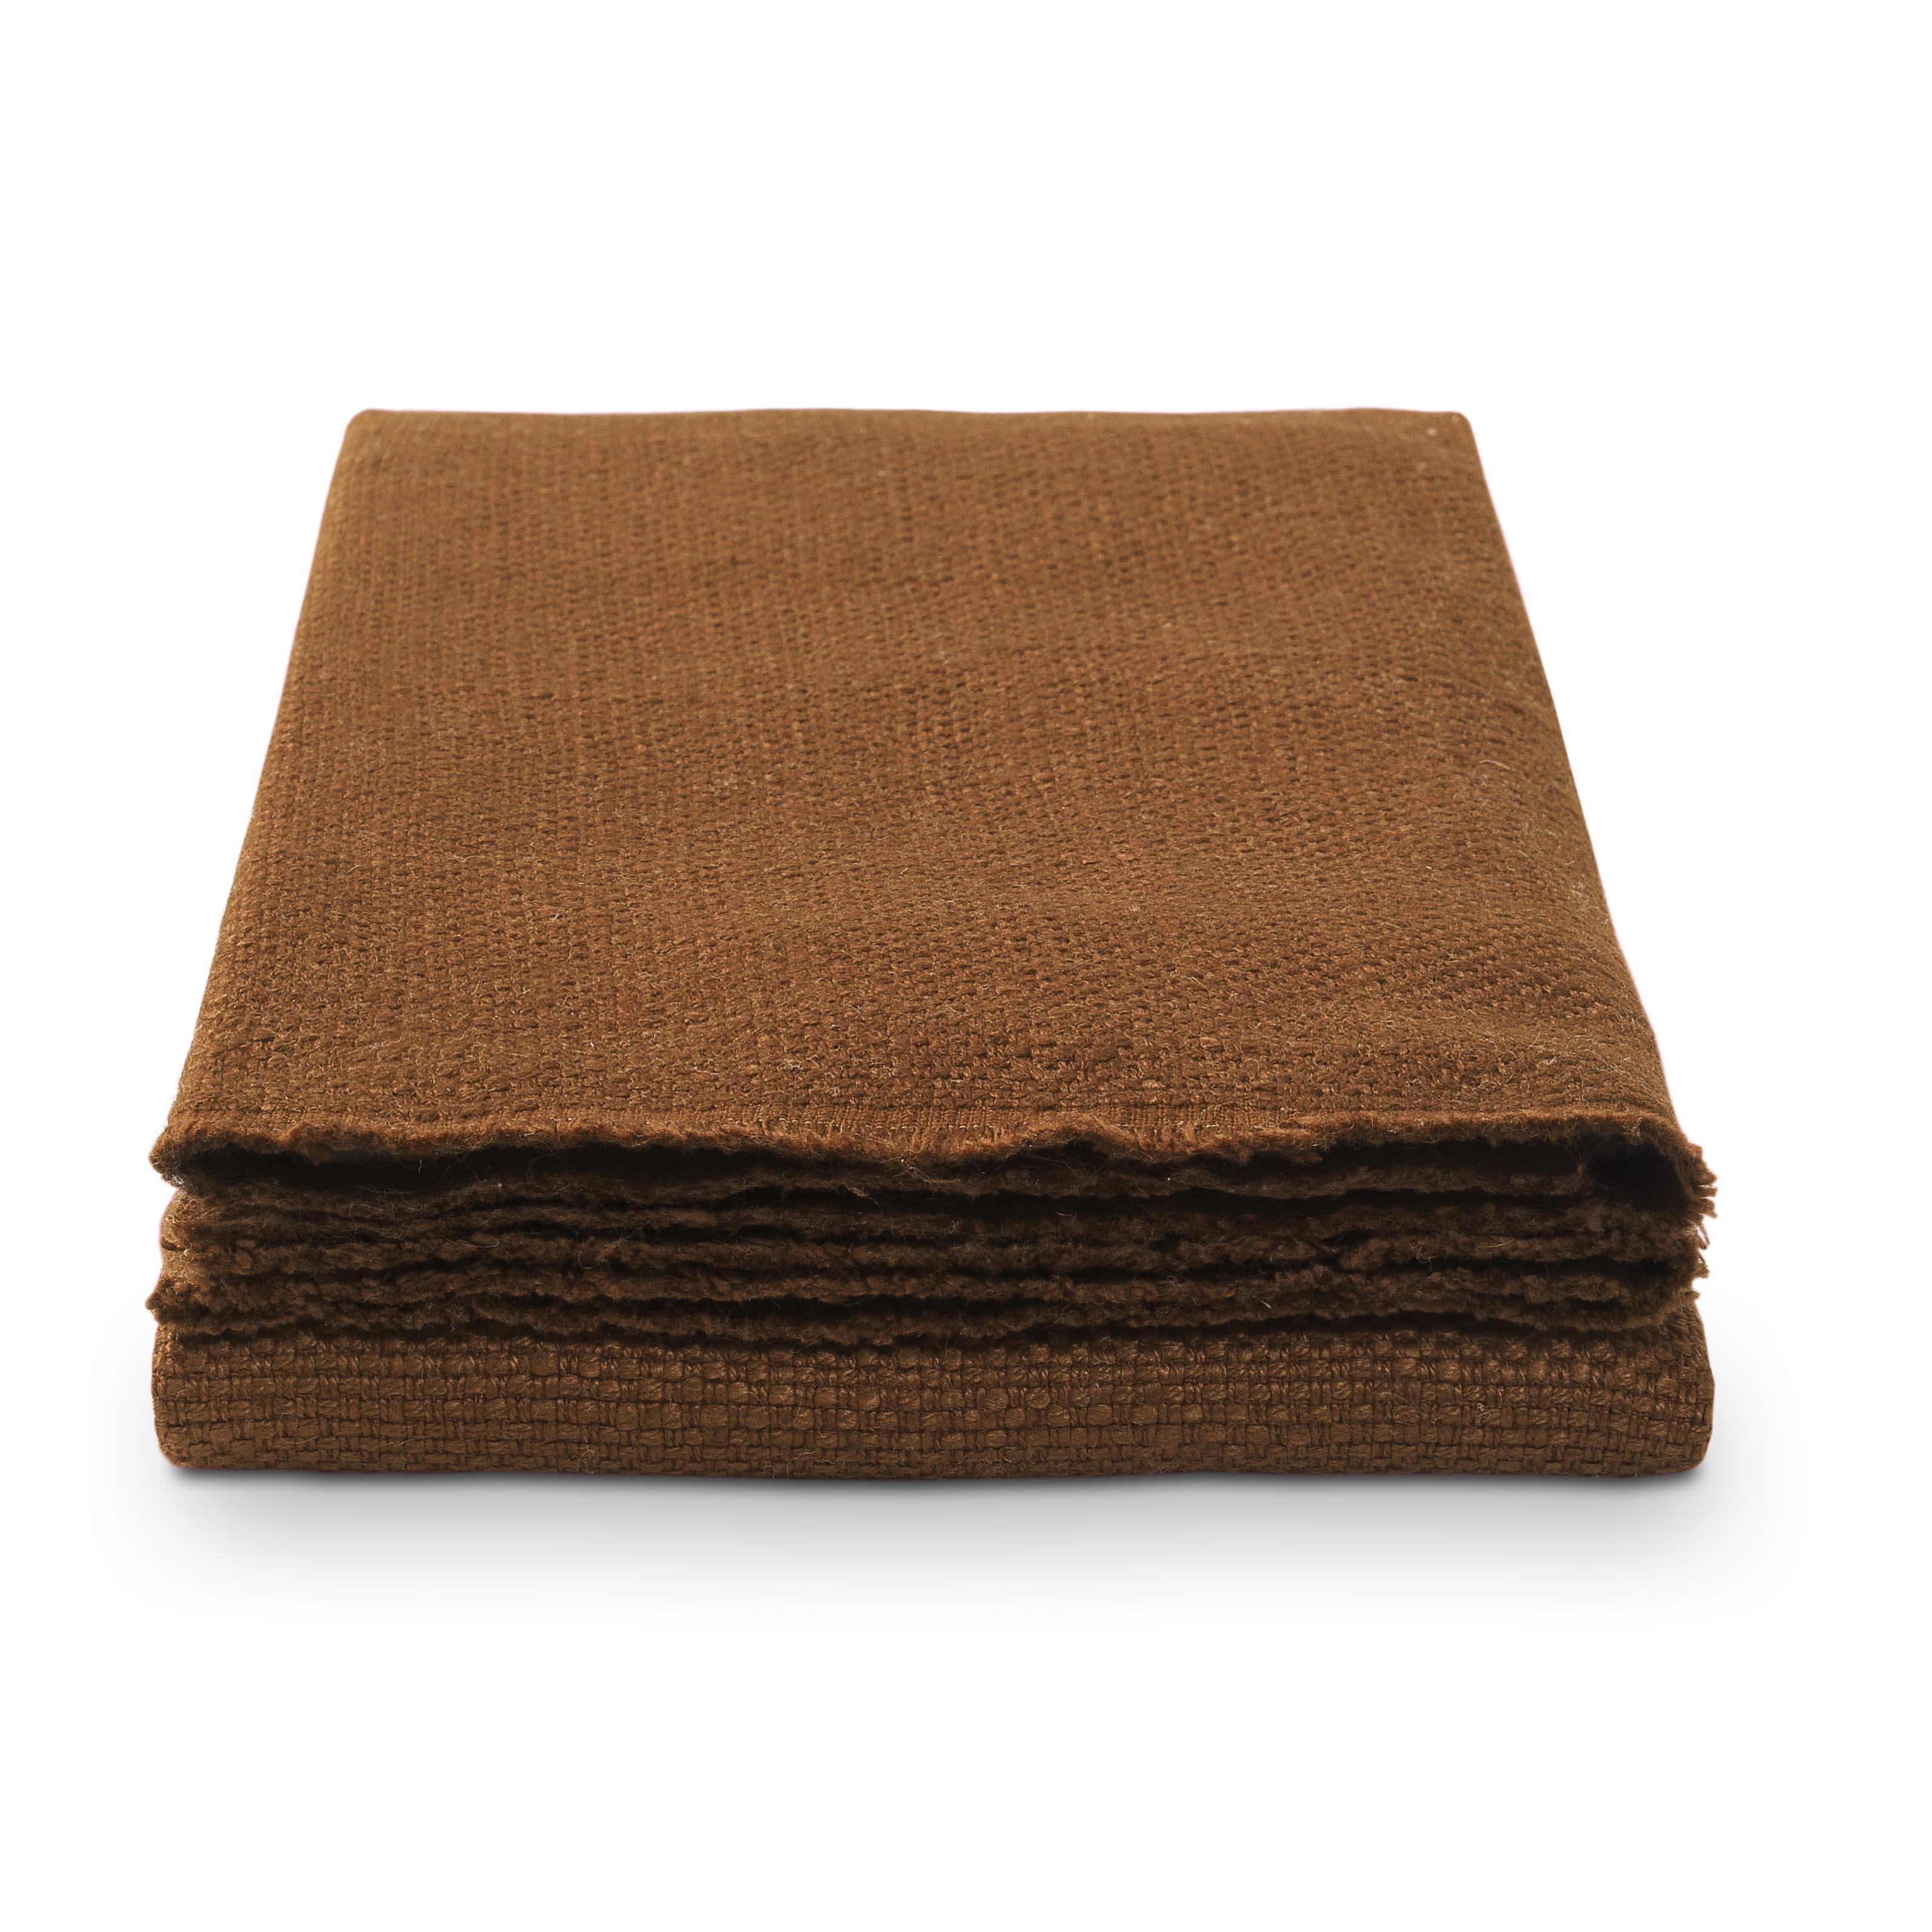 rafael brown lemaitre demeestere